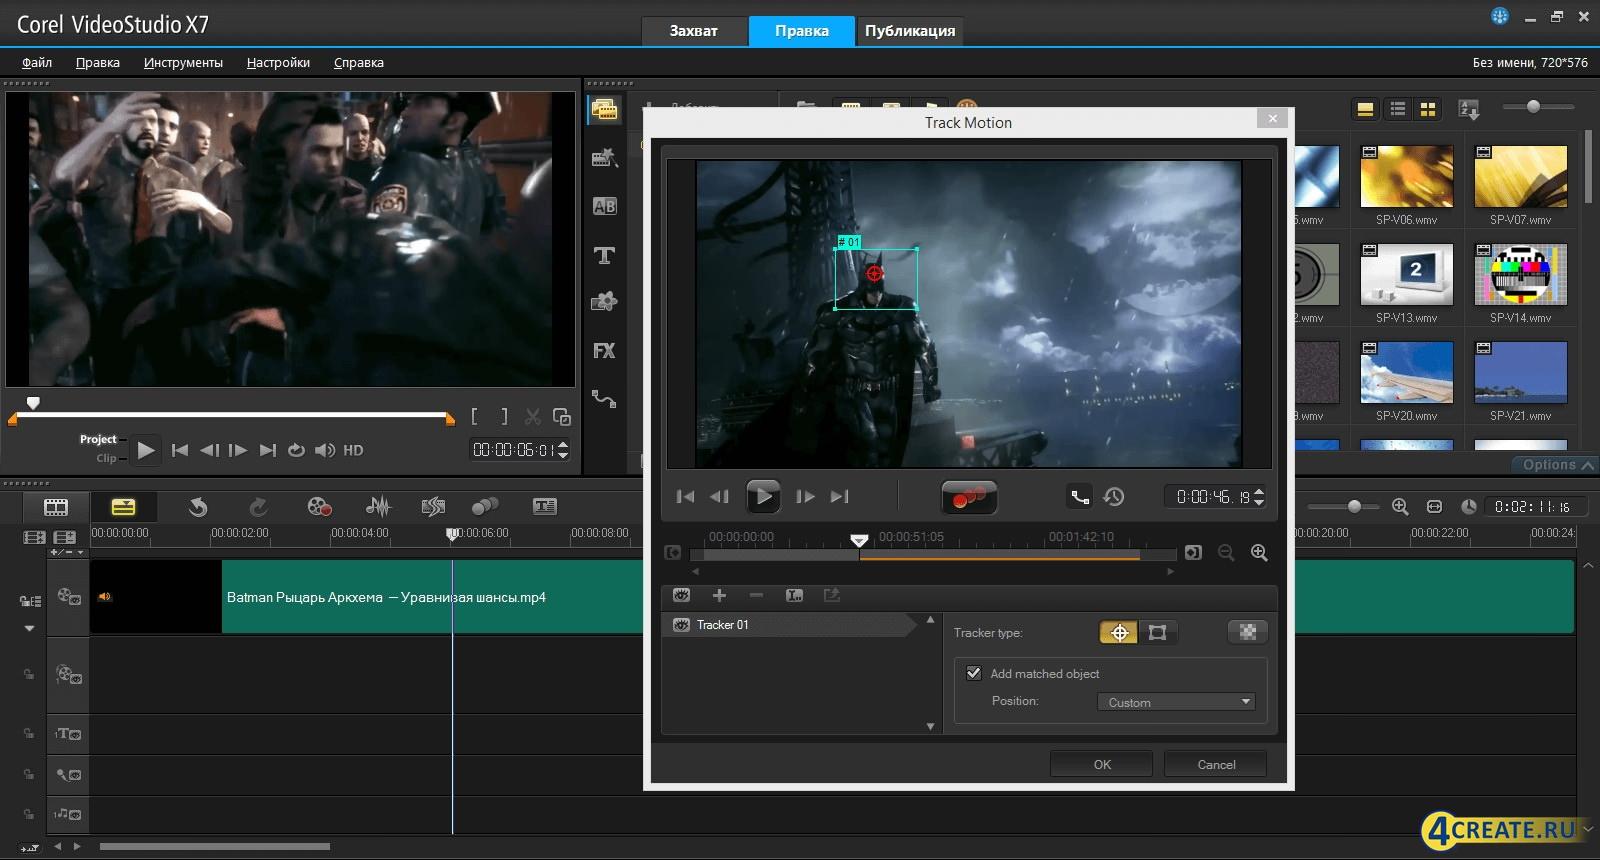 Corel VideoStudio Pro X9 (Скриншот 2)